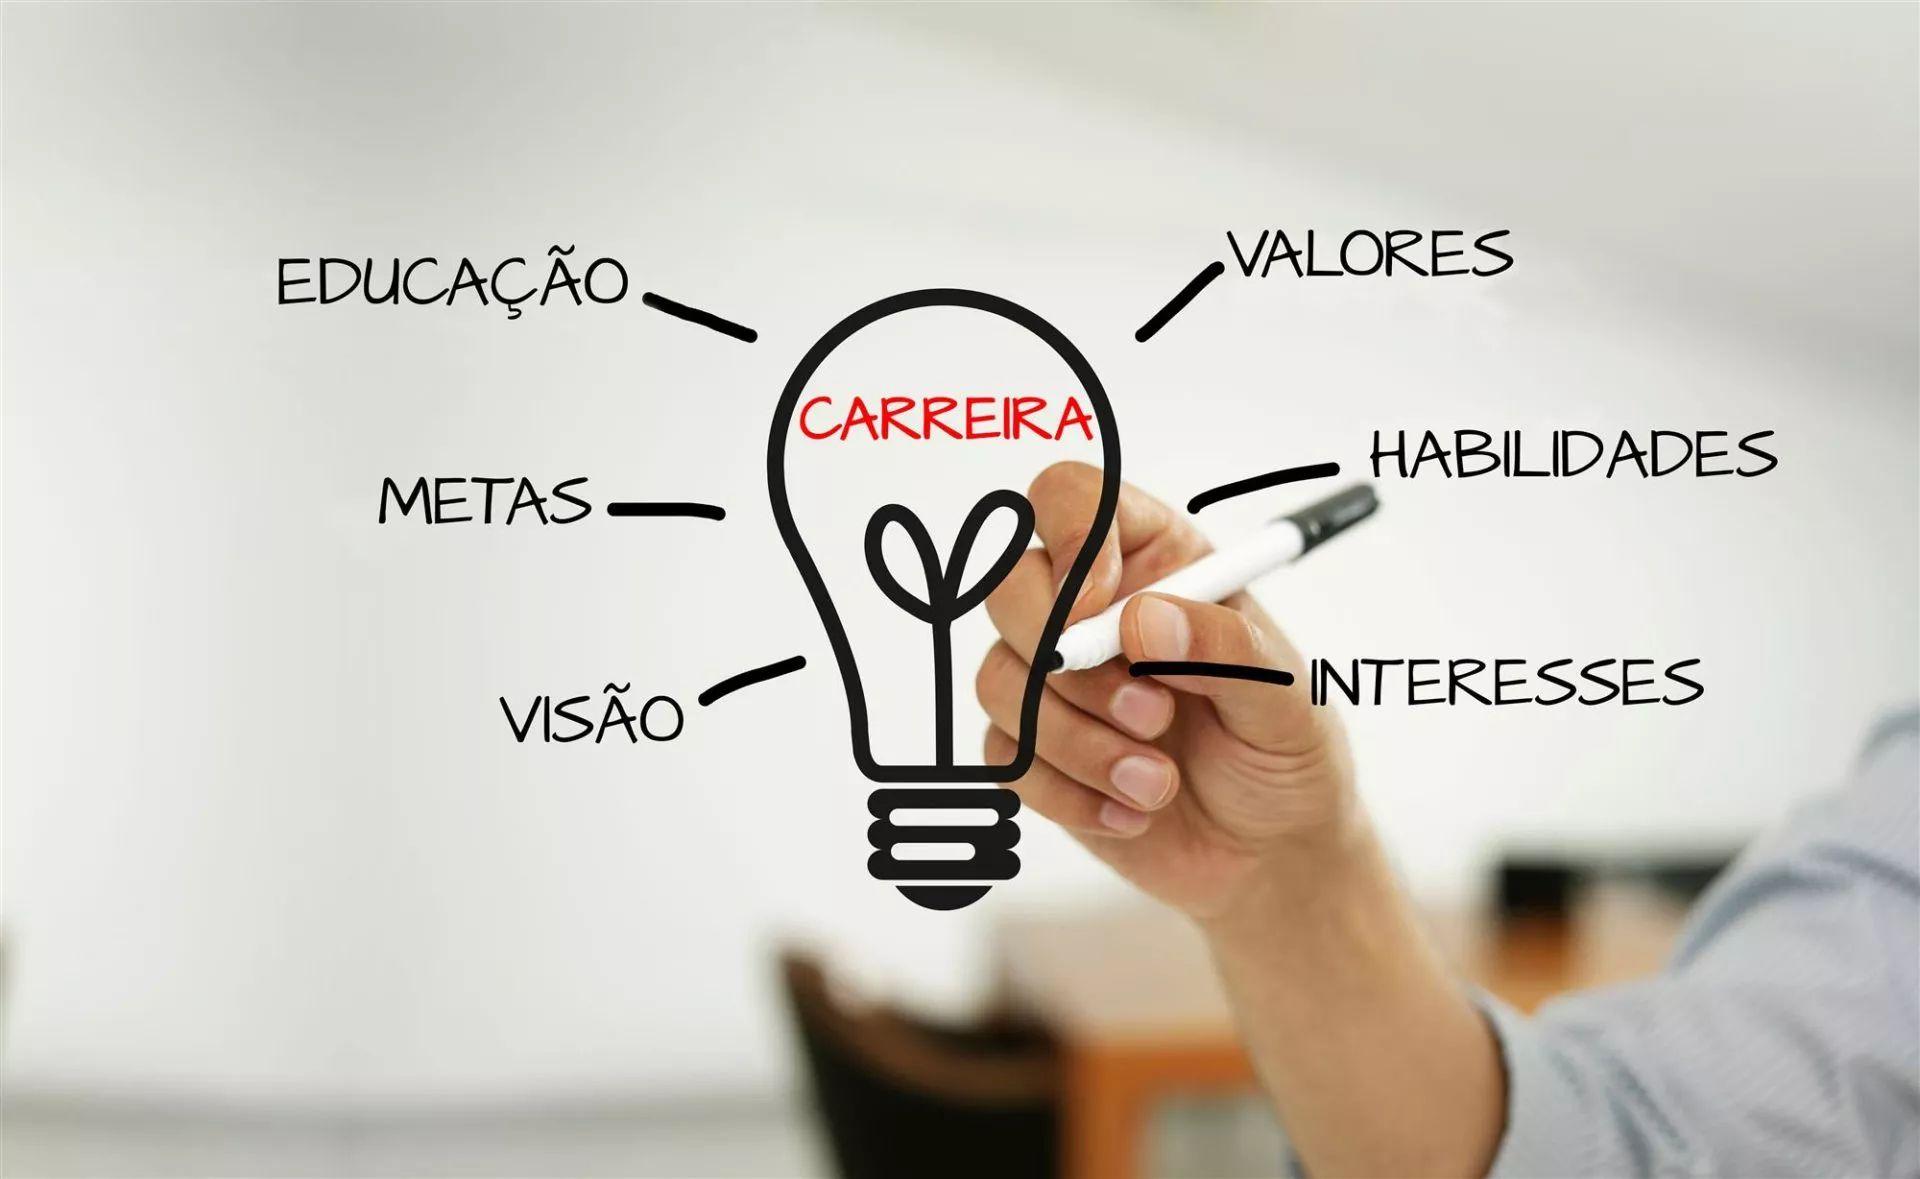 vocational careers